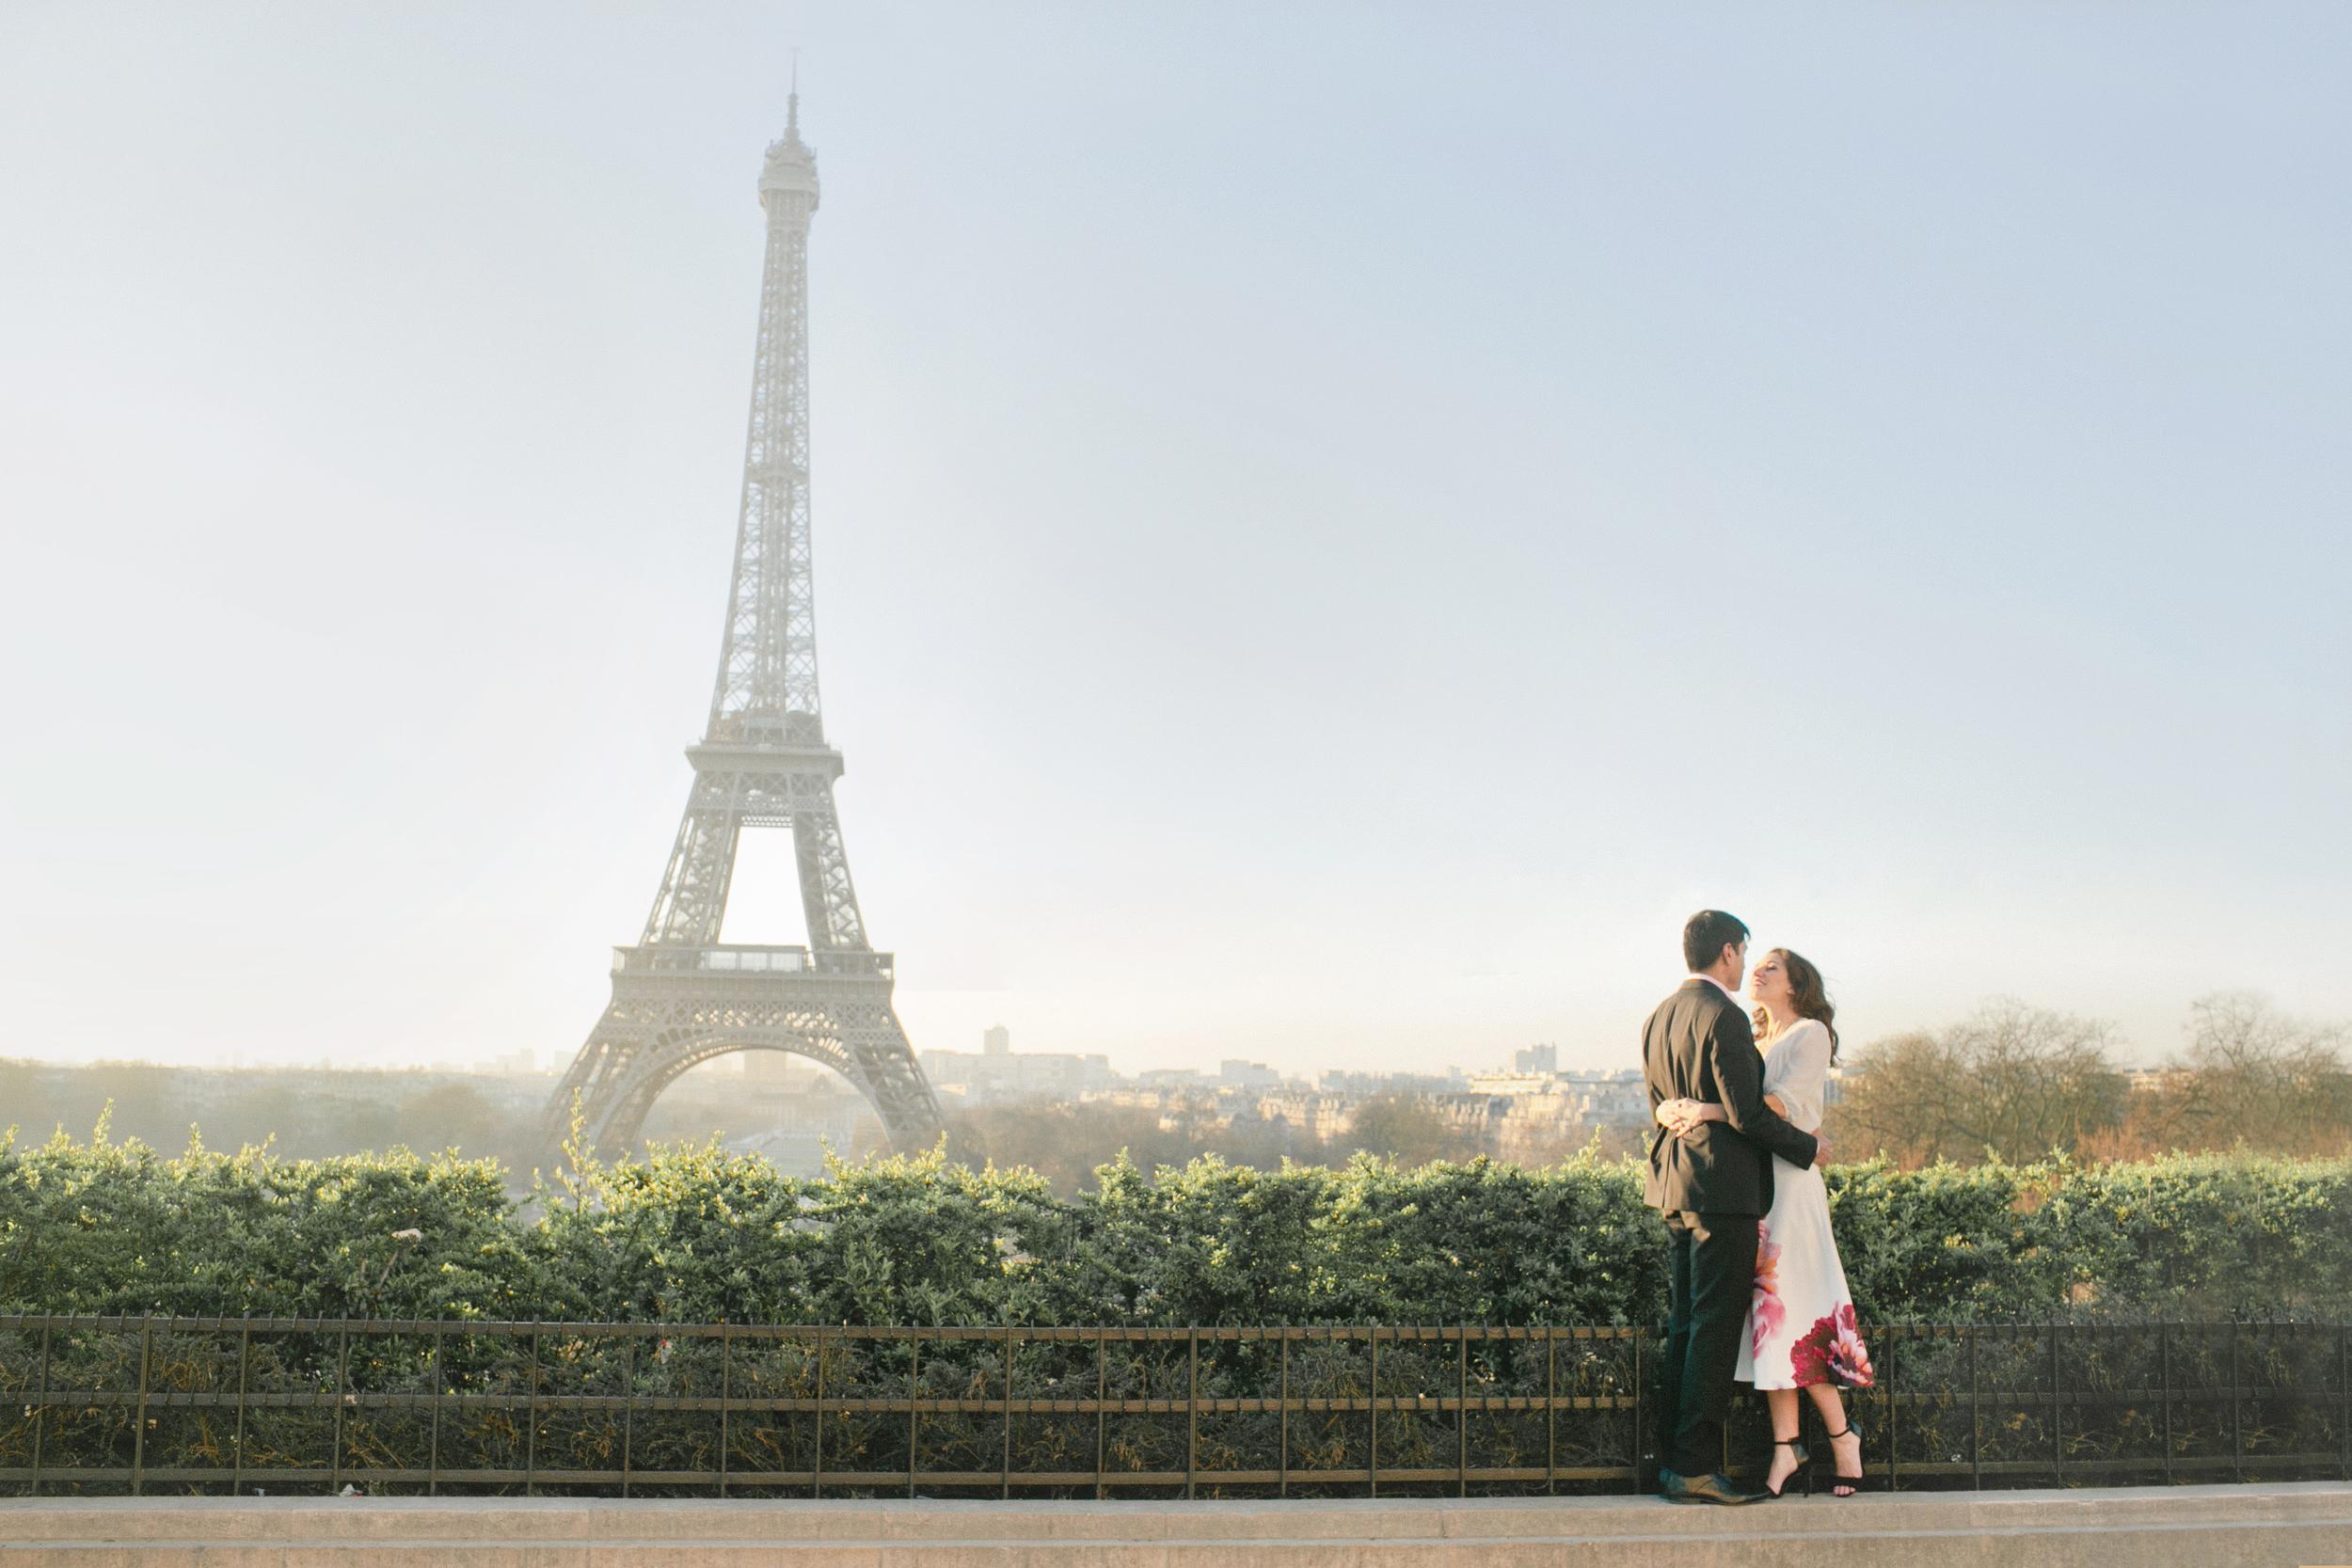 toronto-paris-wedding-photographer-richelle-hunter-photography-michelle-patel-vipil-1 copye.jpg